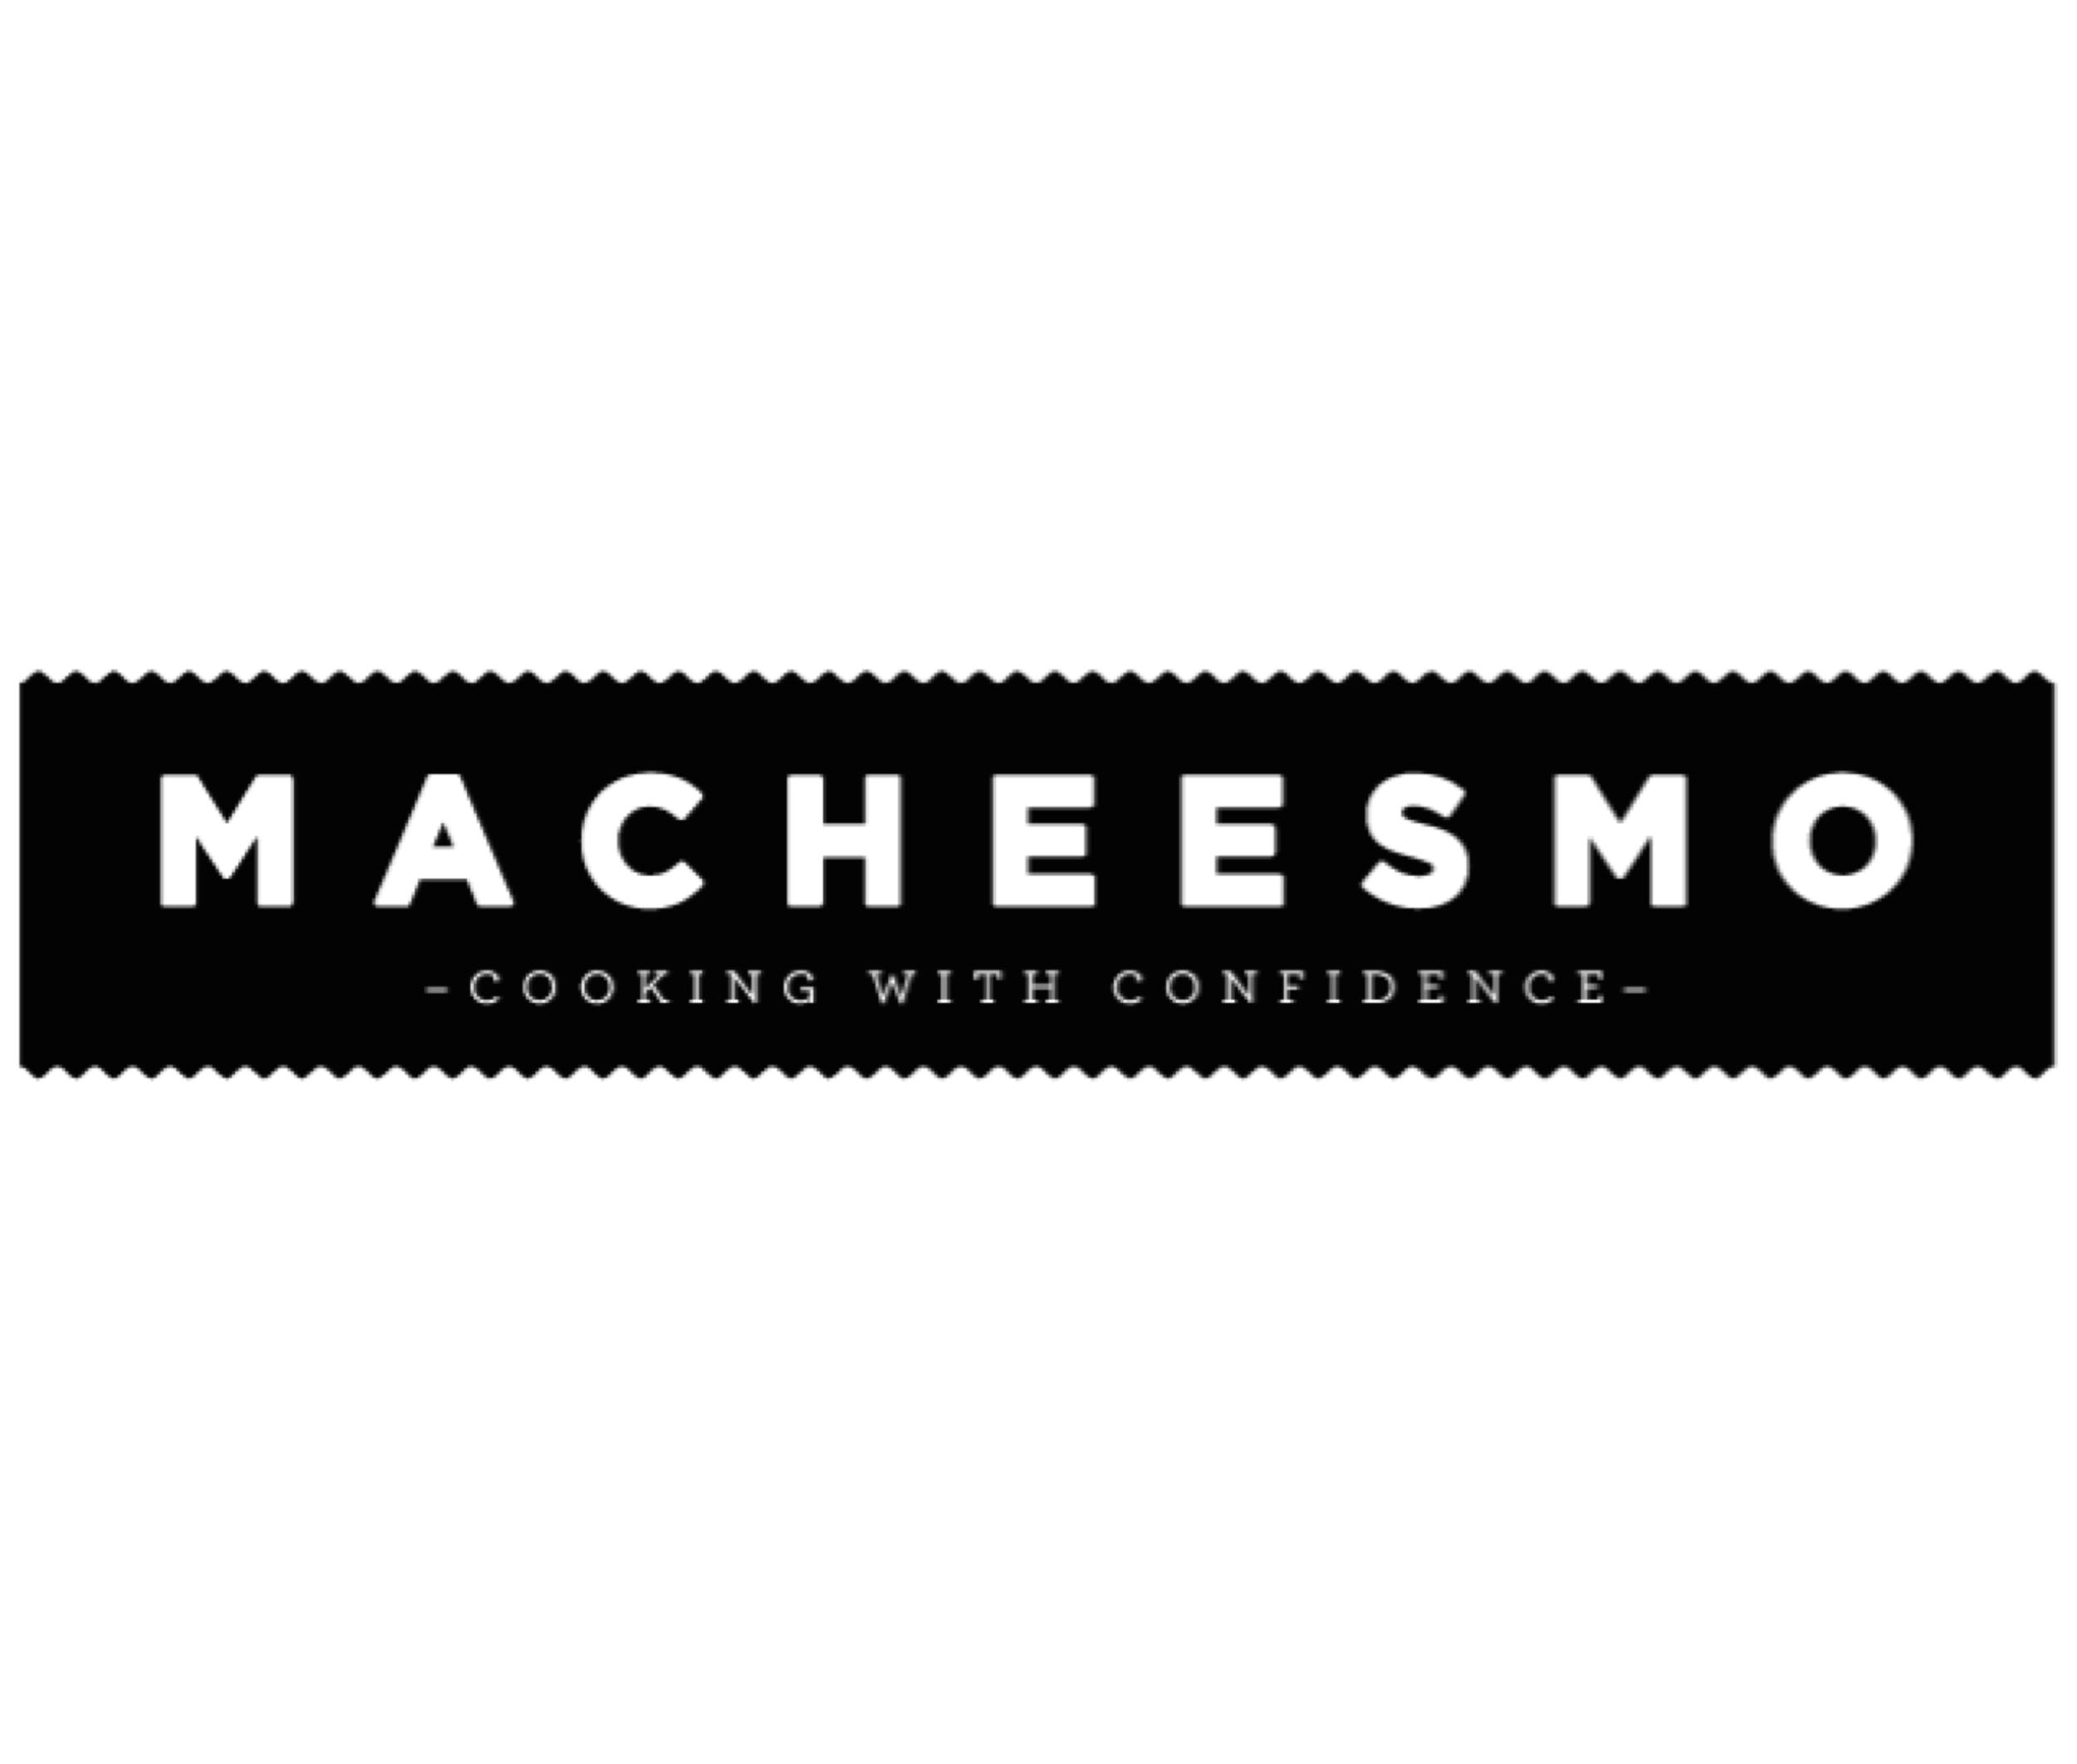 macheesmo logo sq.png